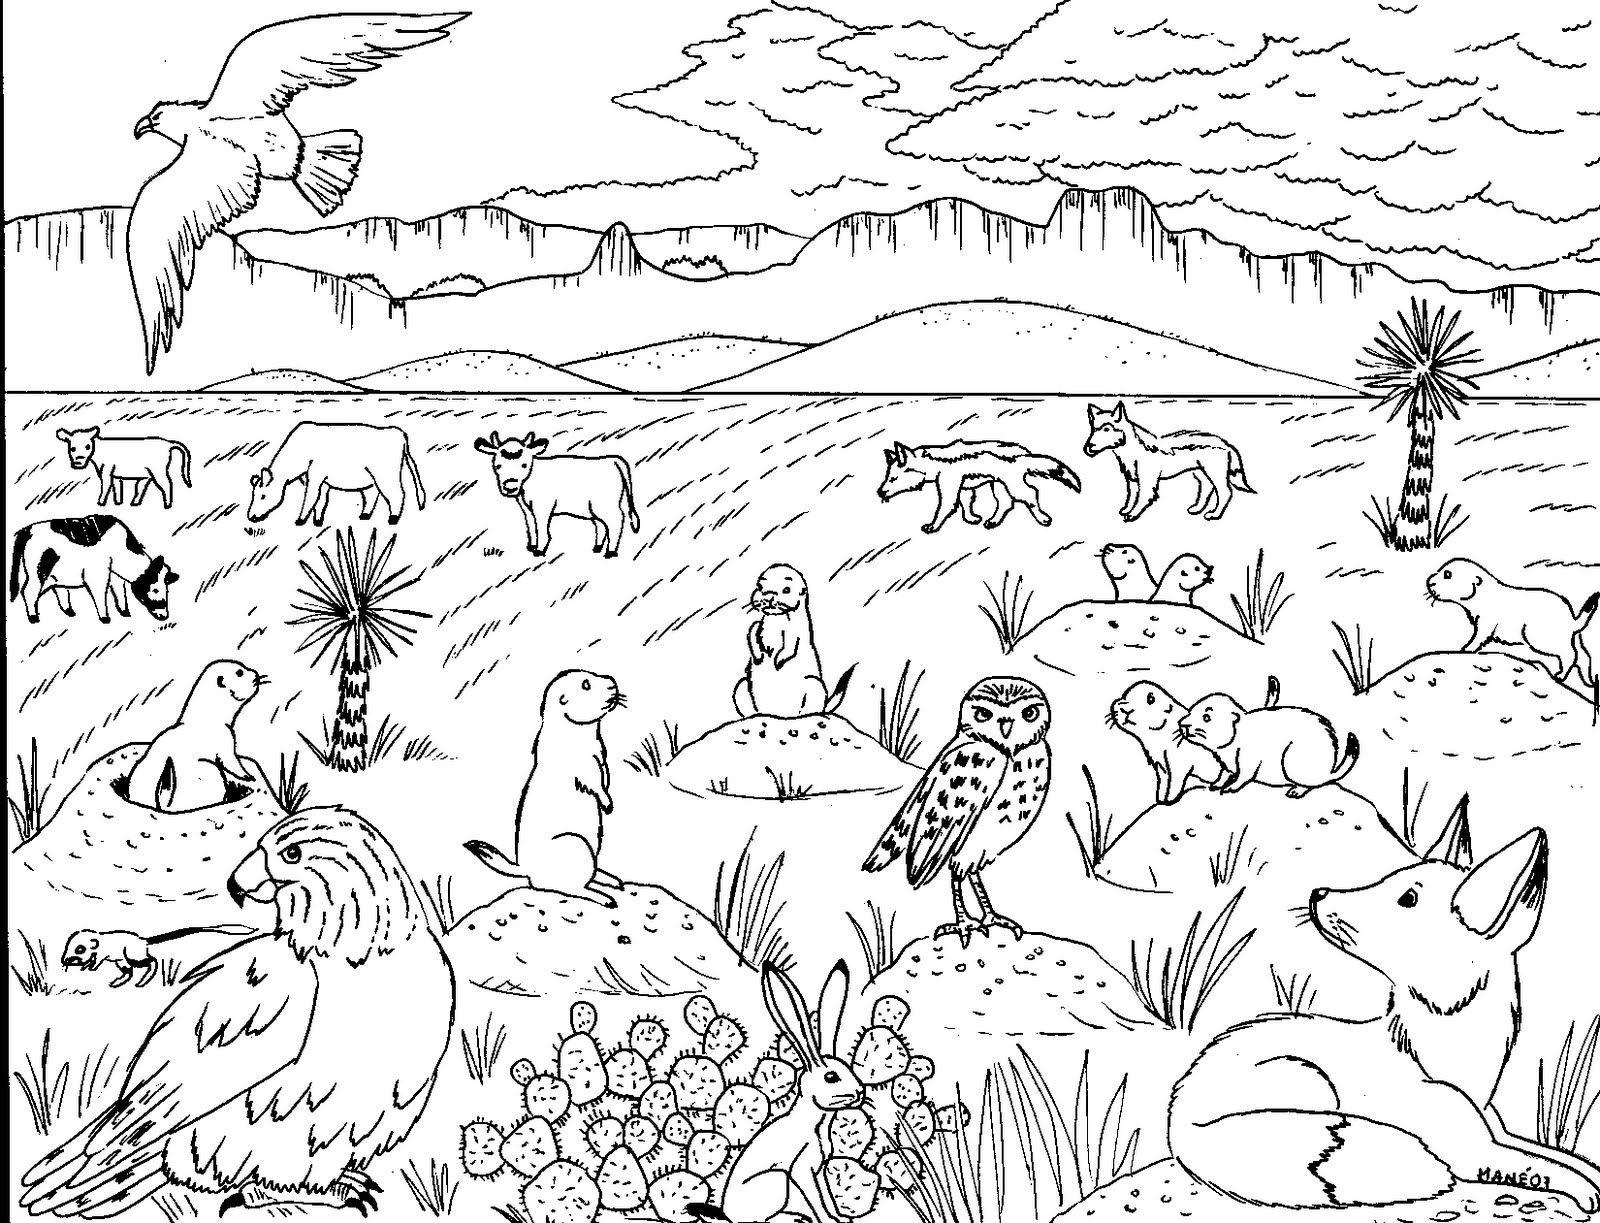 Rumbo a la Sierra Madre Oriental A. C.: Material ambiental para ...